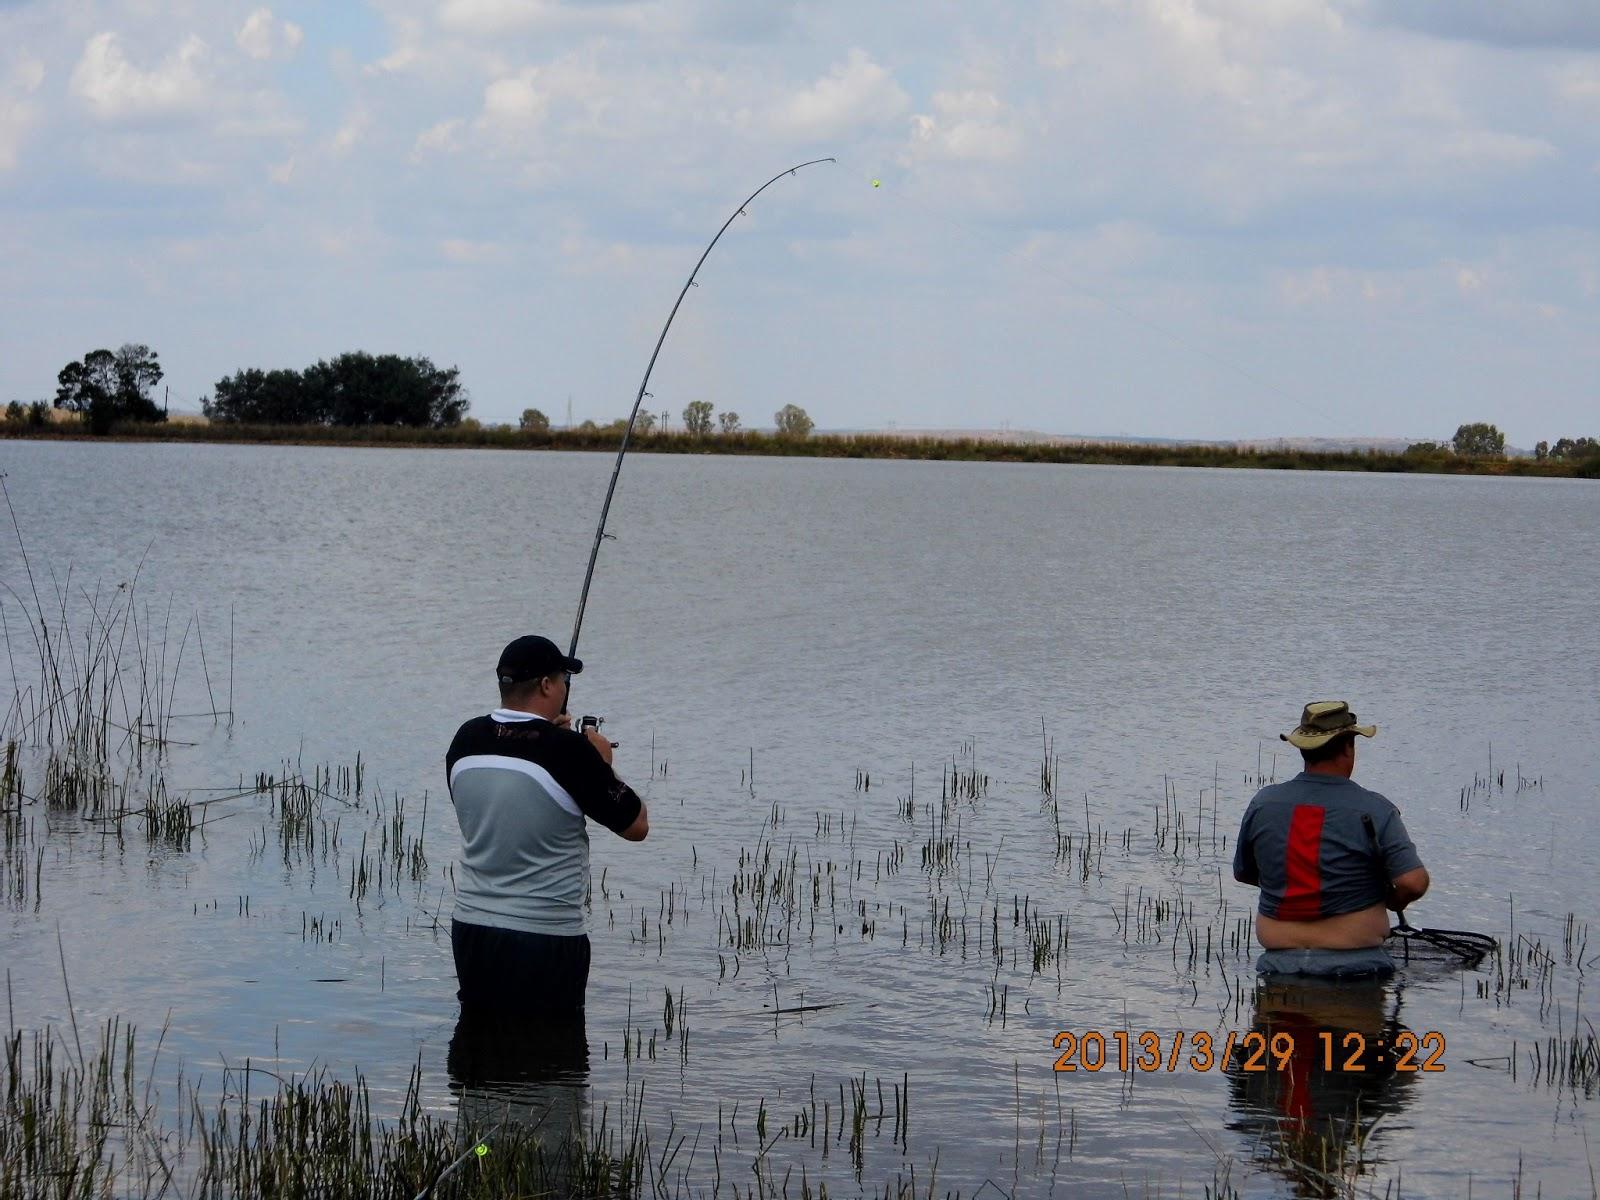 Hooked on fishing bronkhorstspruit private dam for Hooked on fishing